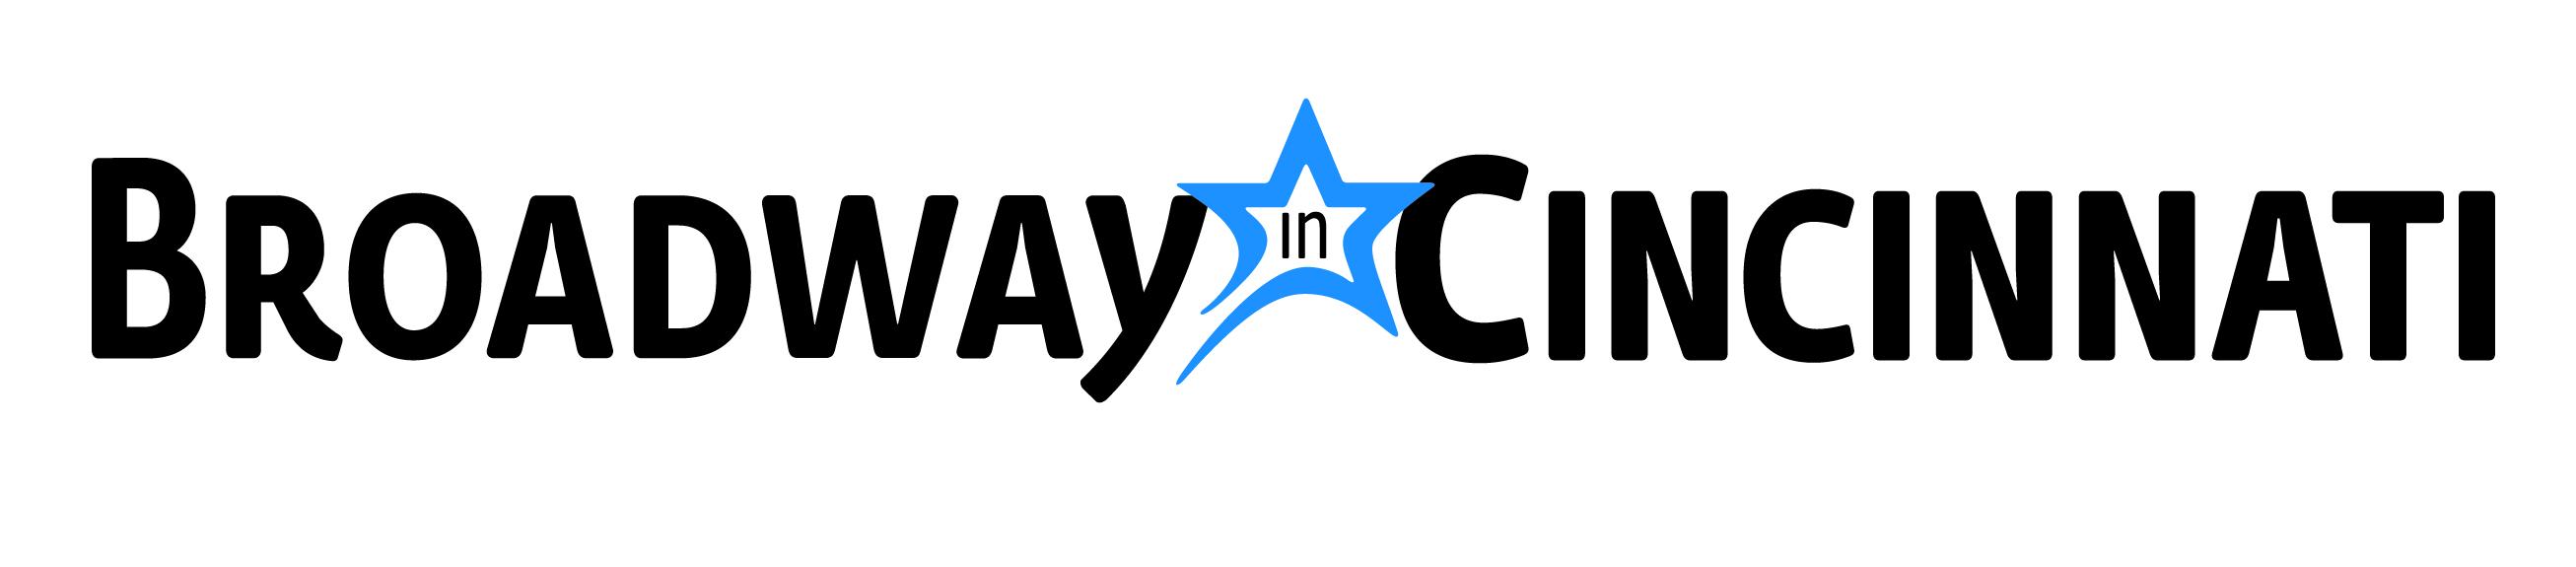 Broadway in Cincinnati News